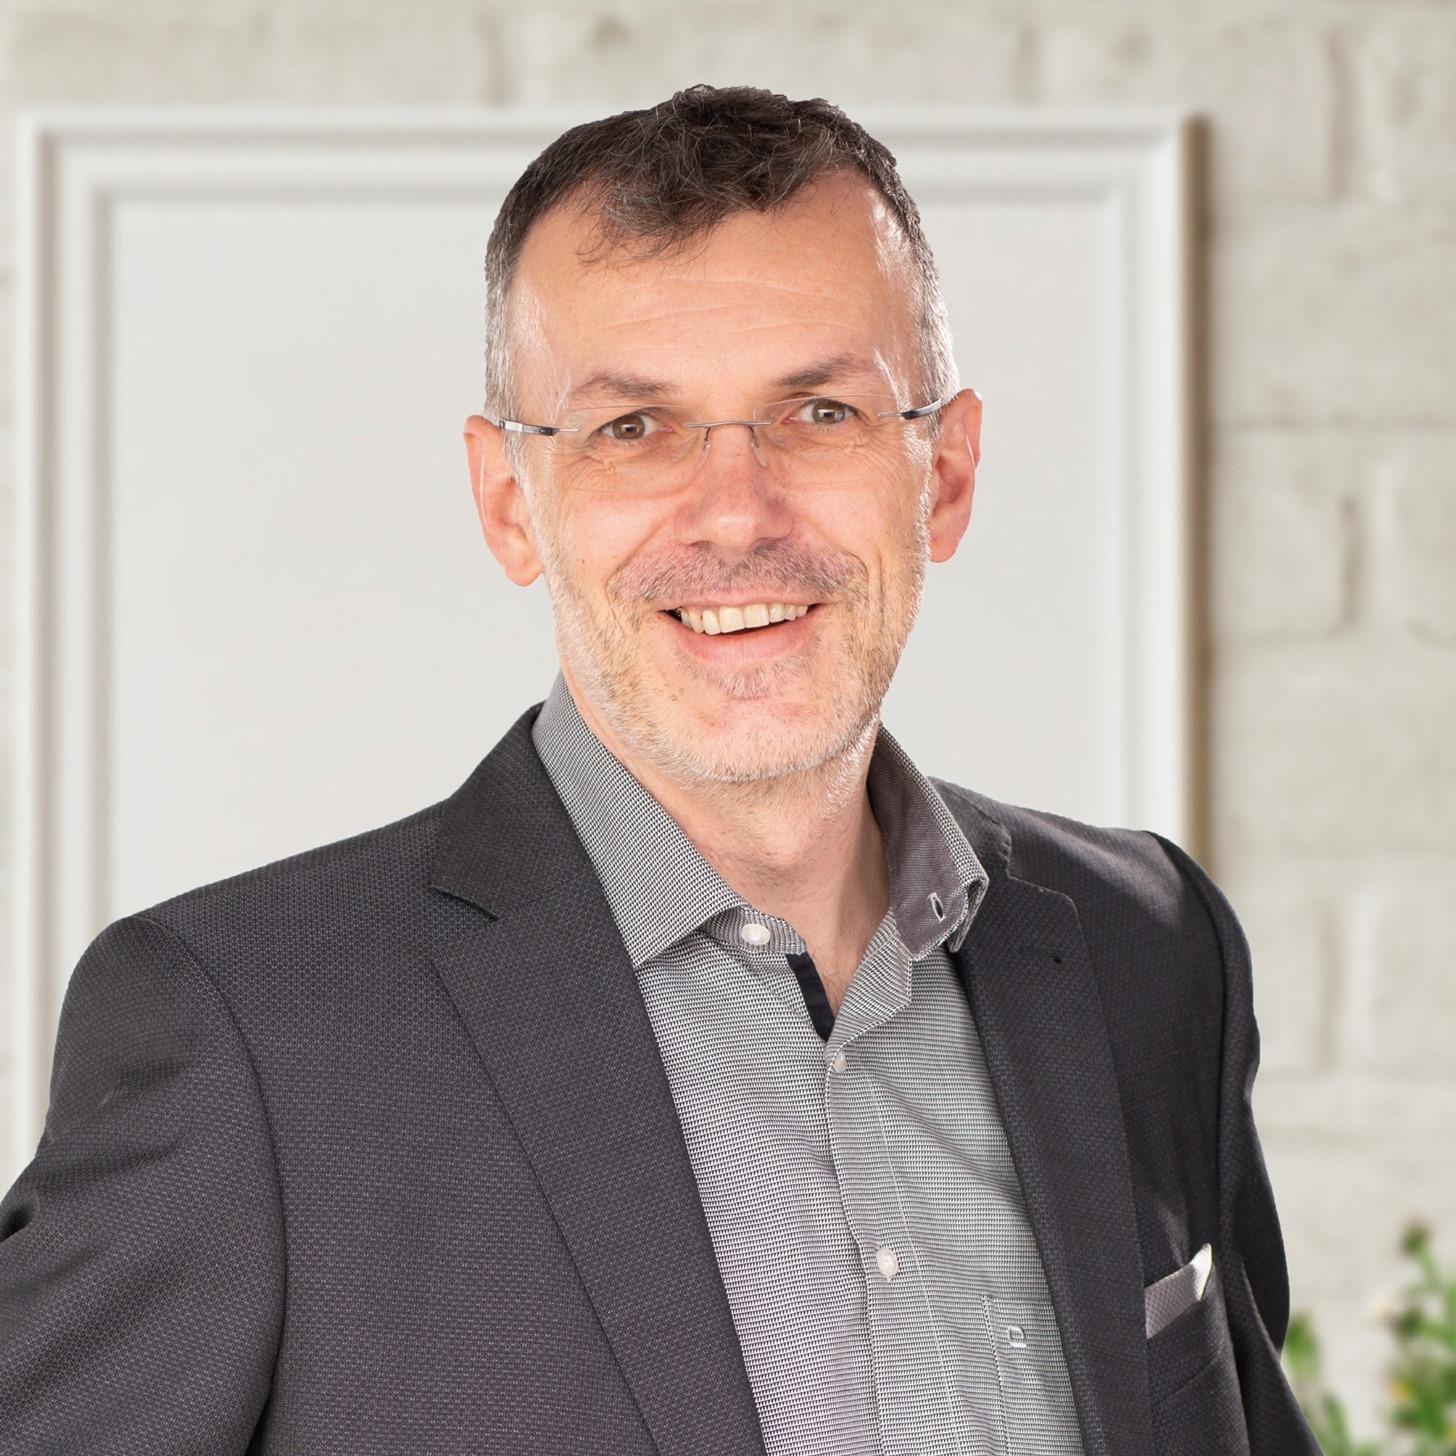 Jens Heuser